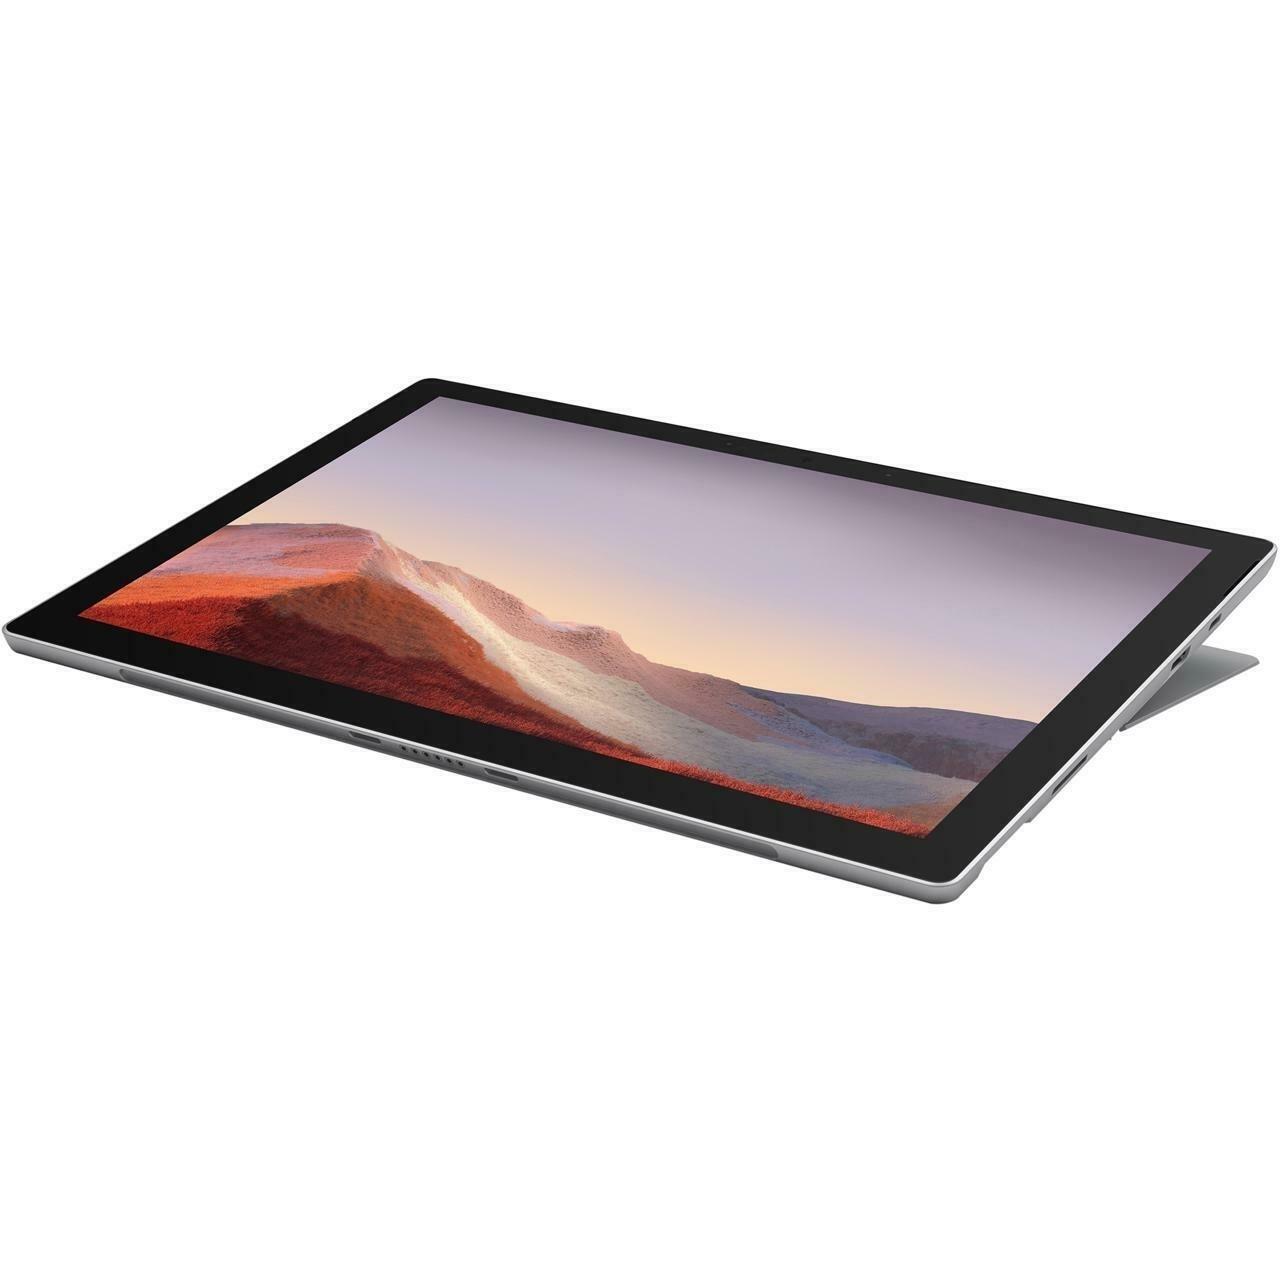 "Microsoft Surface Pro 6 12"" Core i5 1.6 GHz - SSD 256 GB - 8 GB"